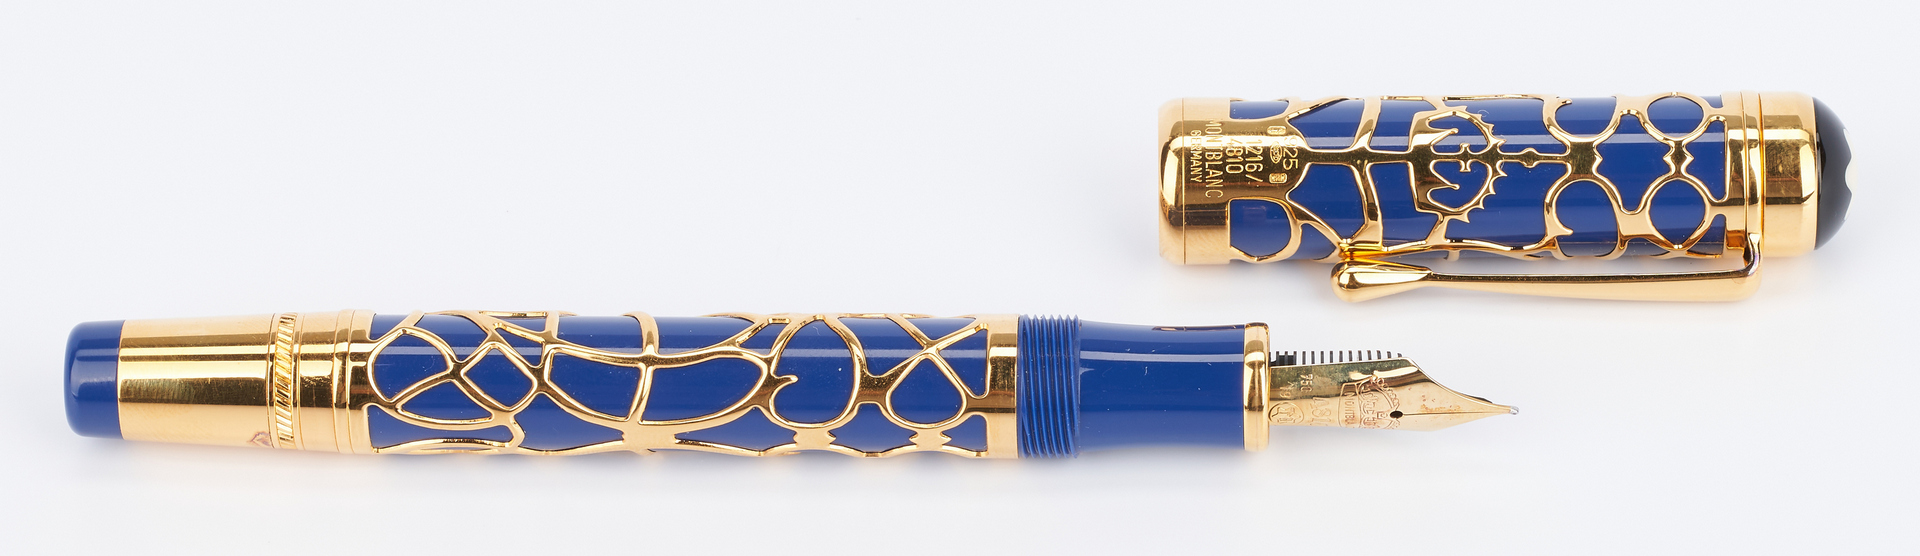 Lot 45: Montblanc Prince Regent 4810 Ltd. Ed. Fountain Pen